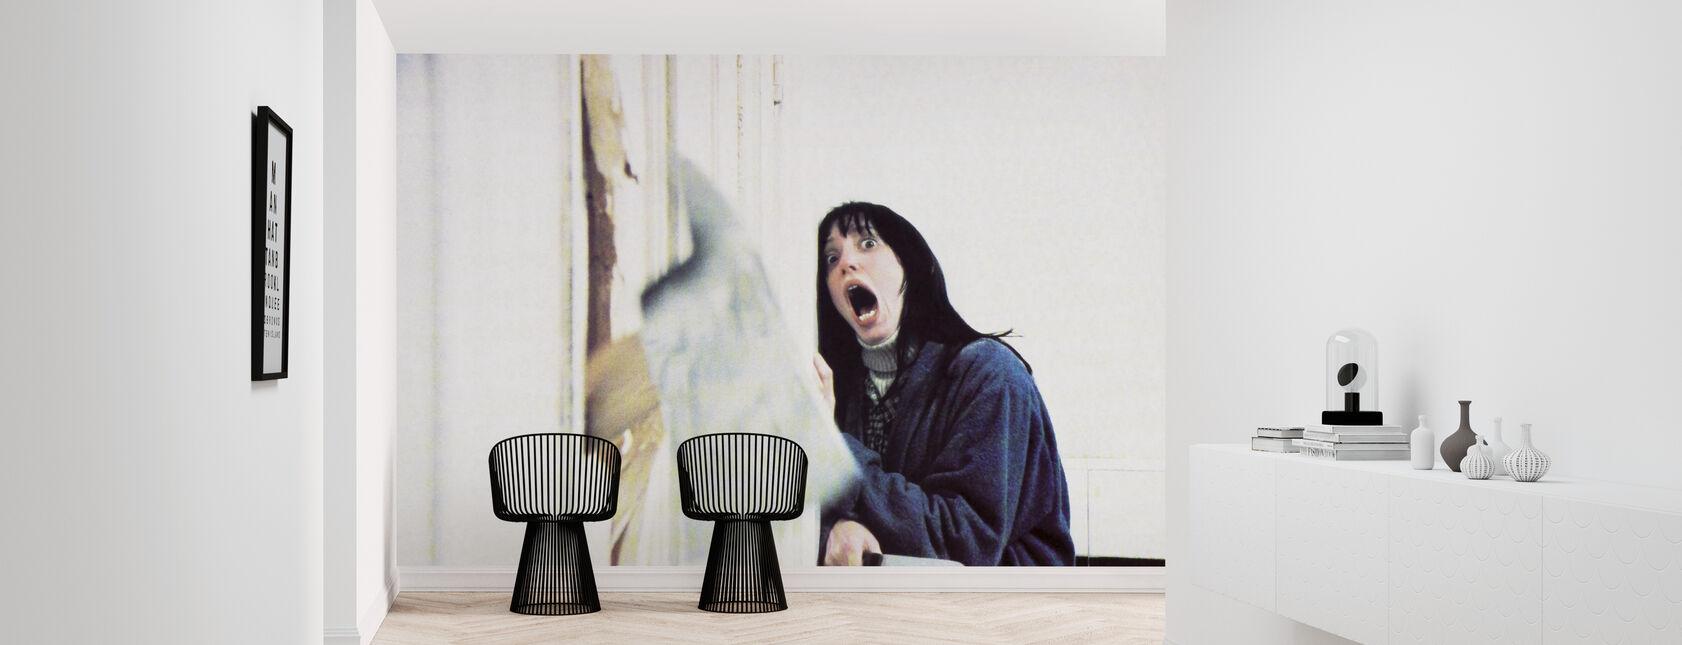 Shining - Shelley Duvall - Wallpaper - Hallway